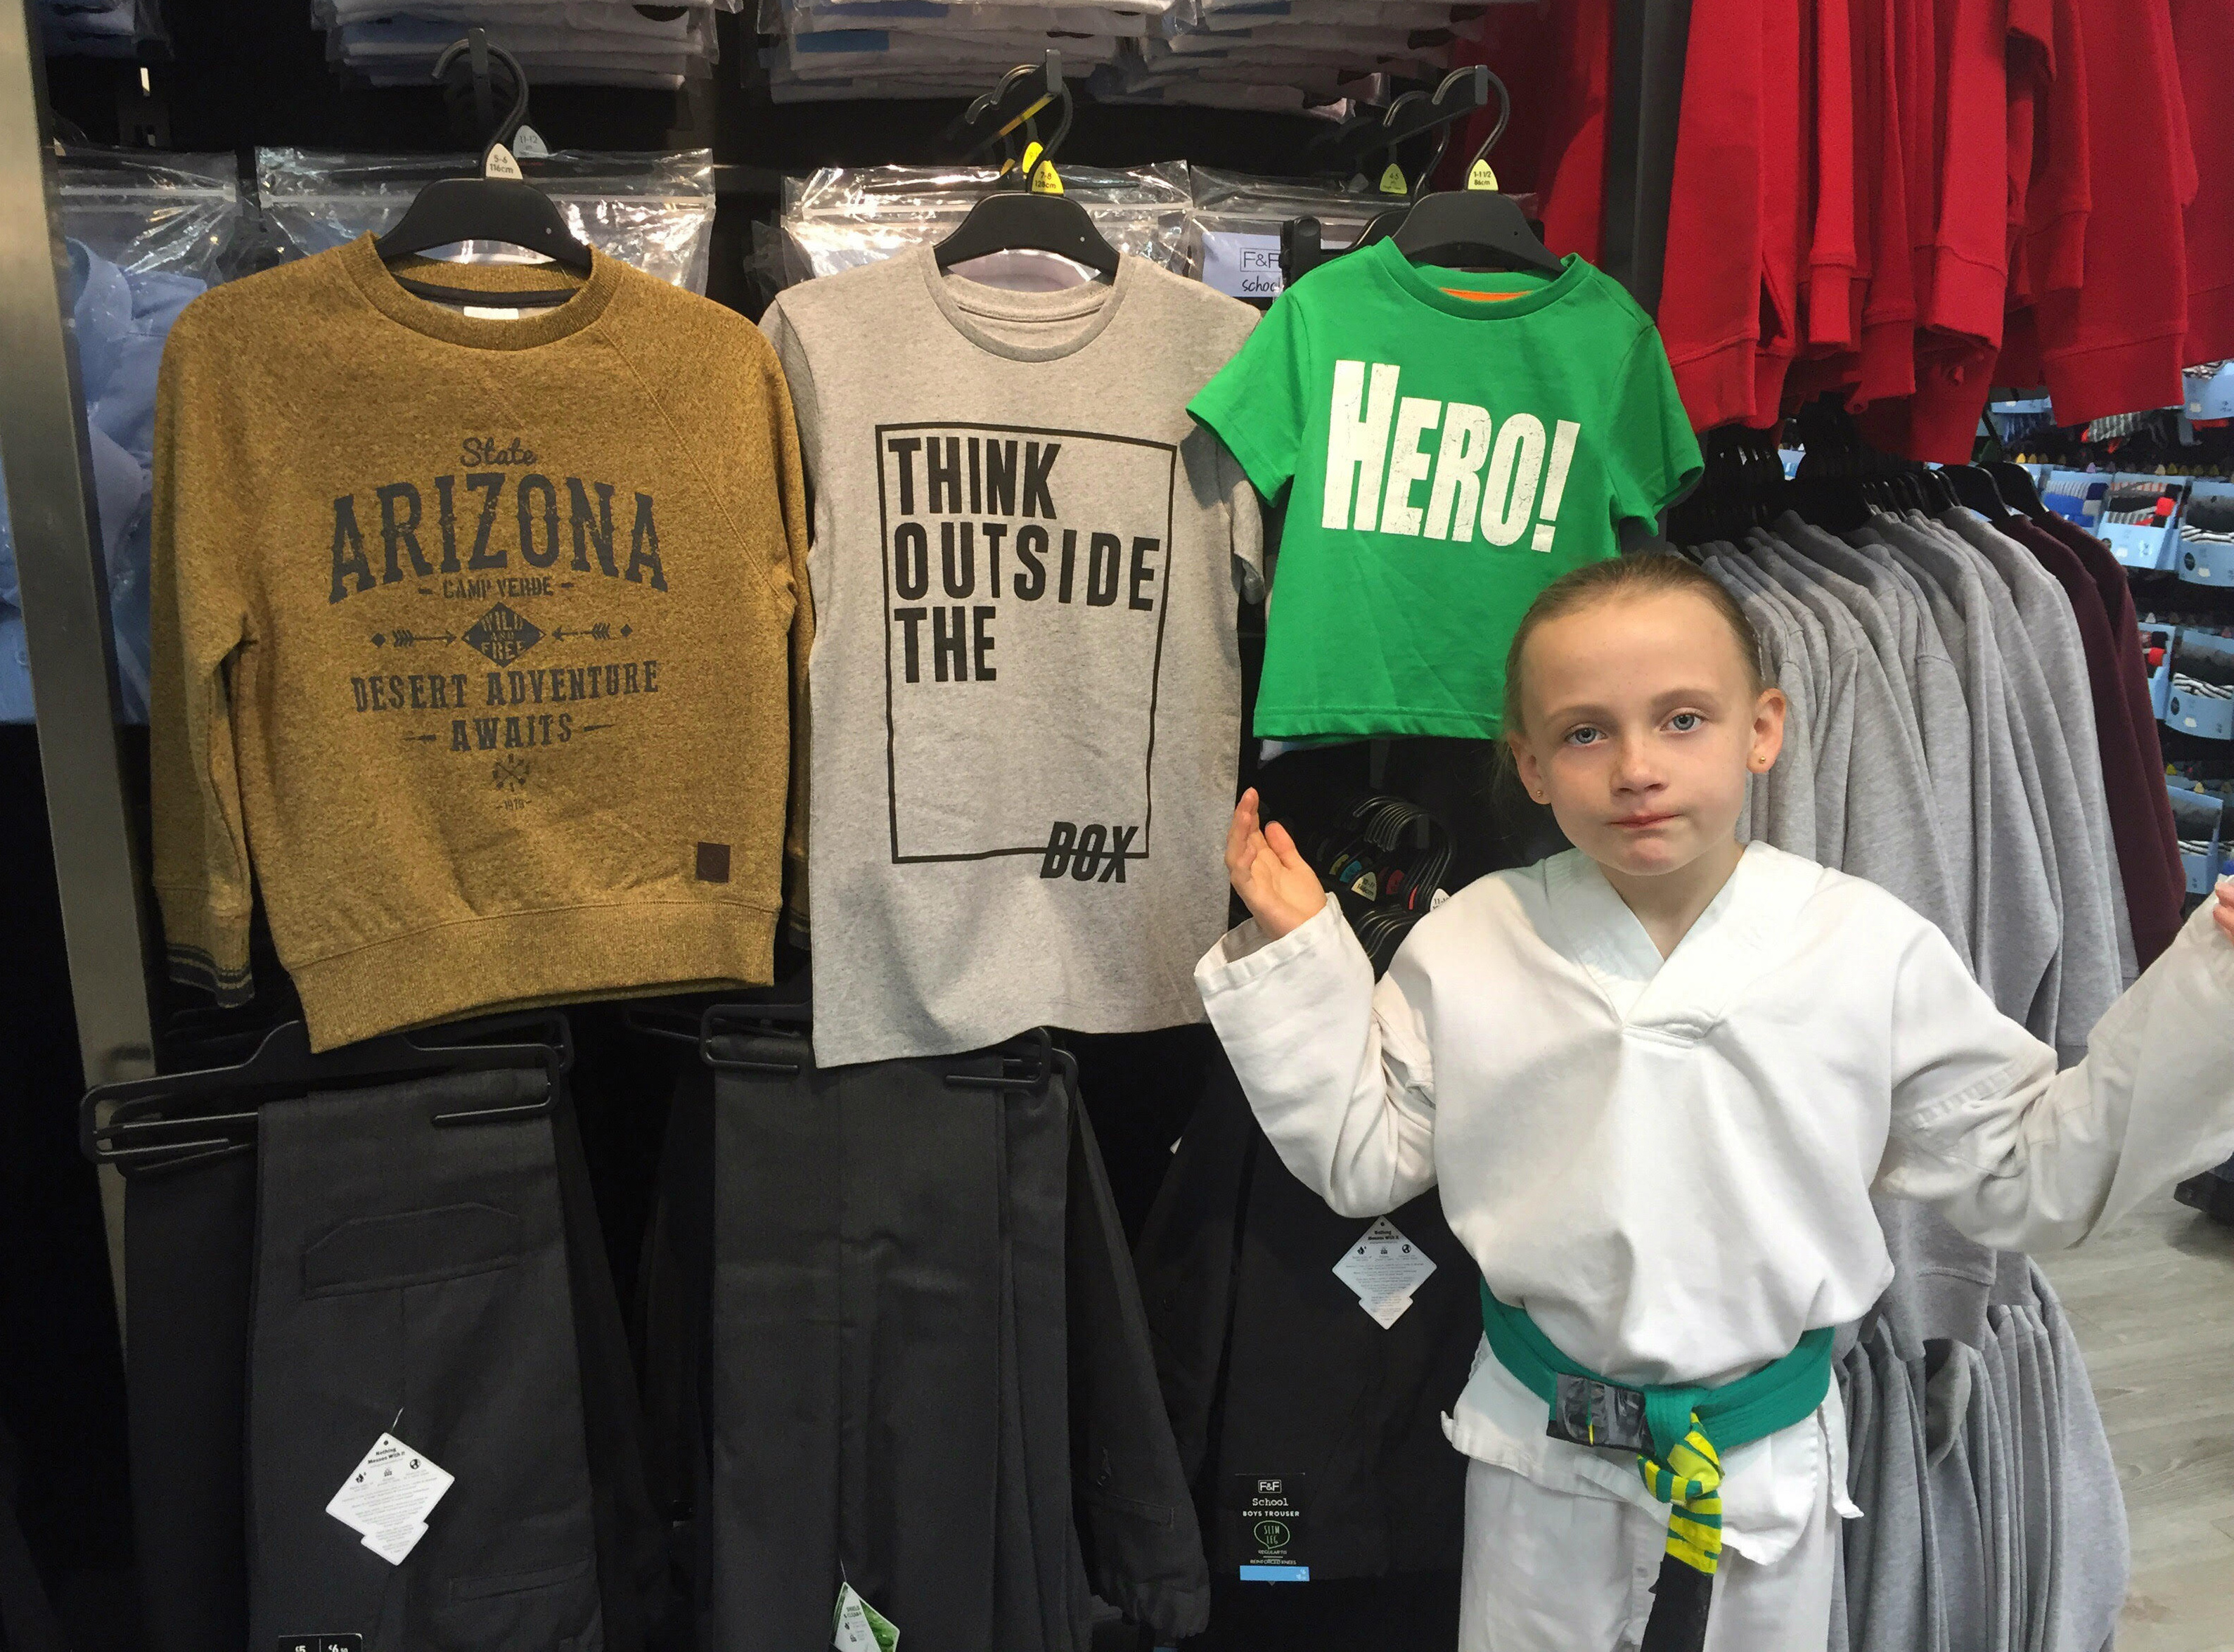 Daisy Edmonds 'sexist' childrens clothes